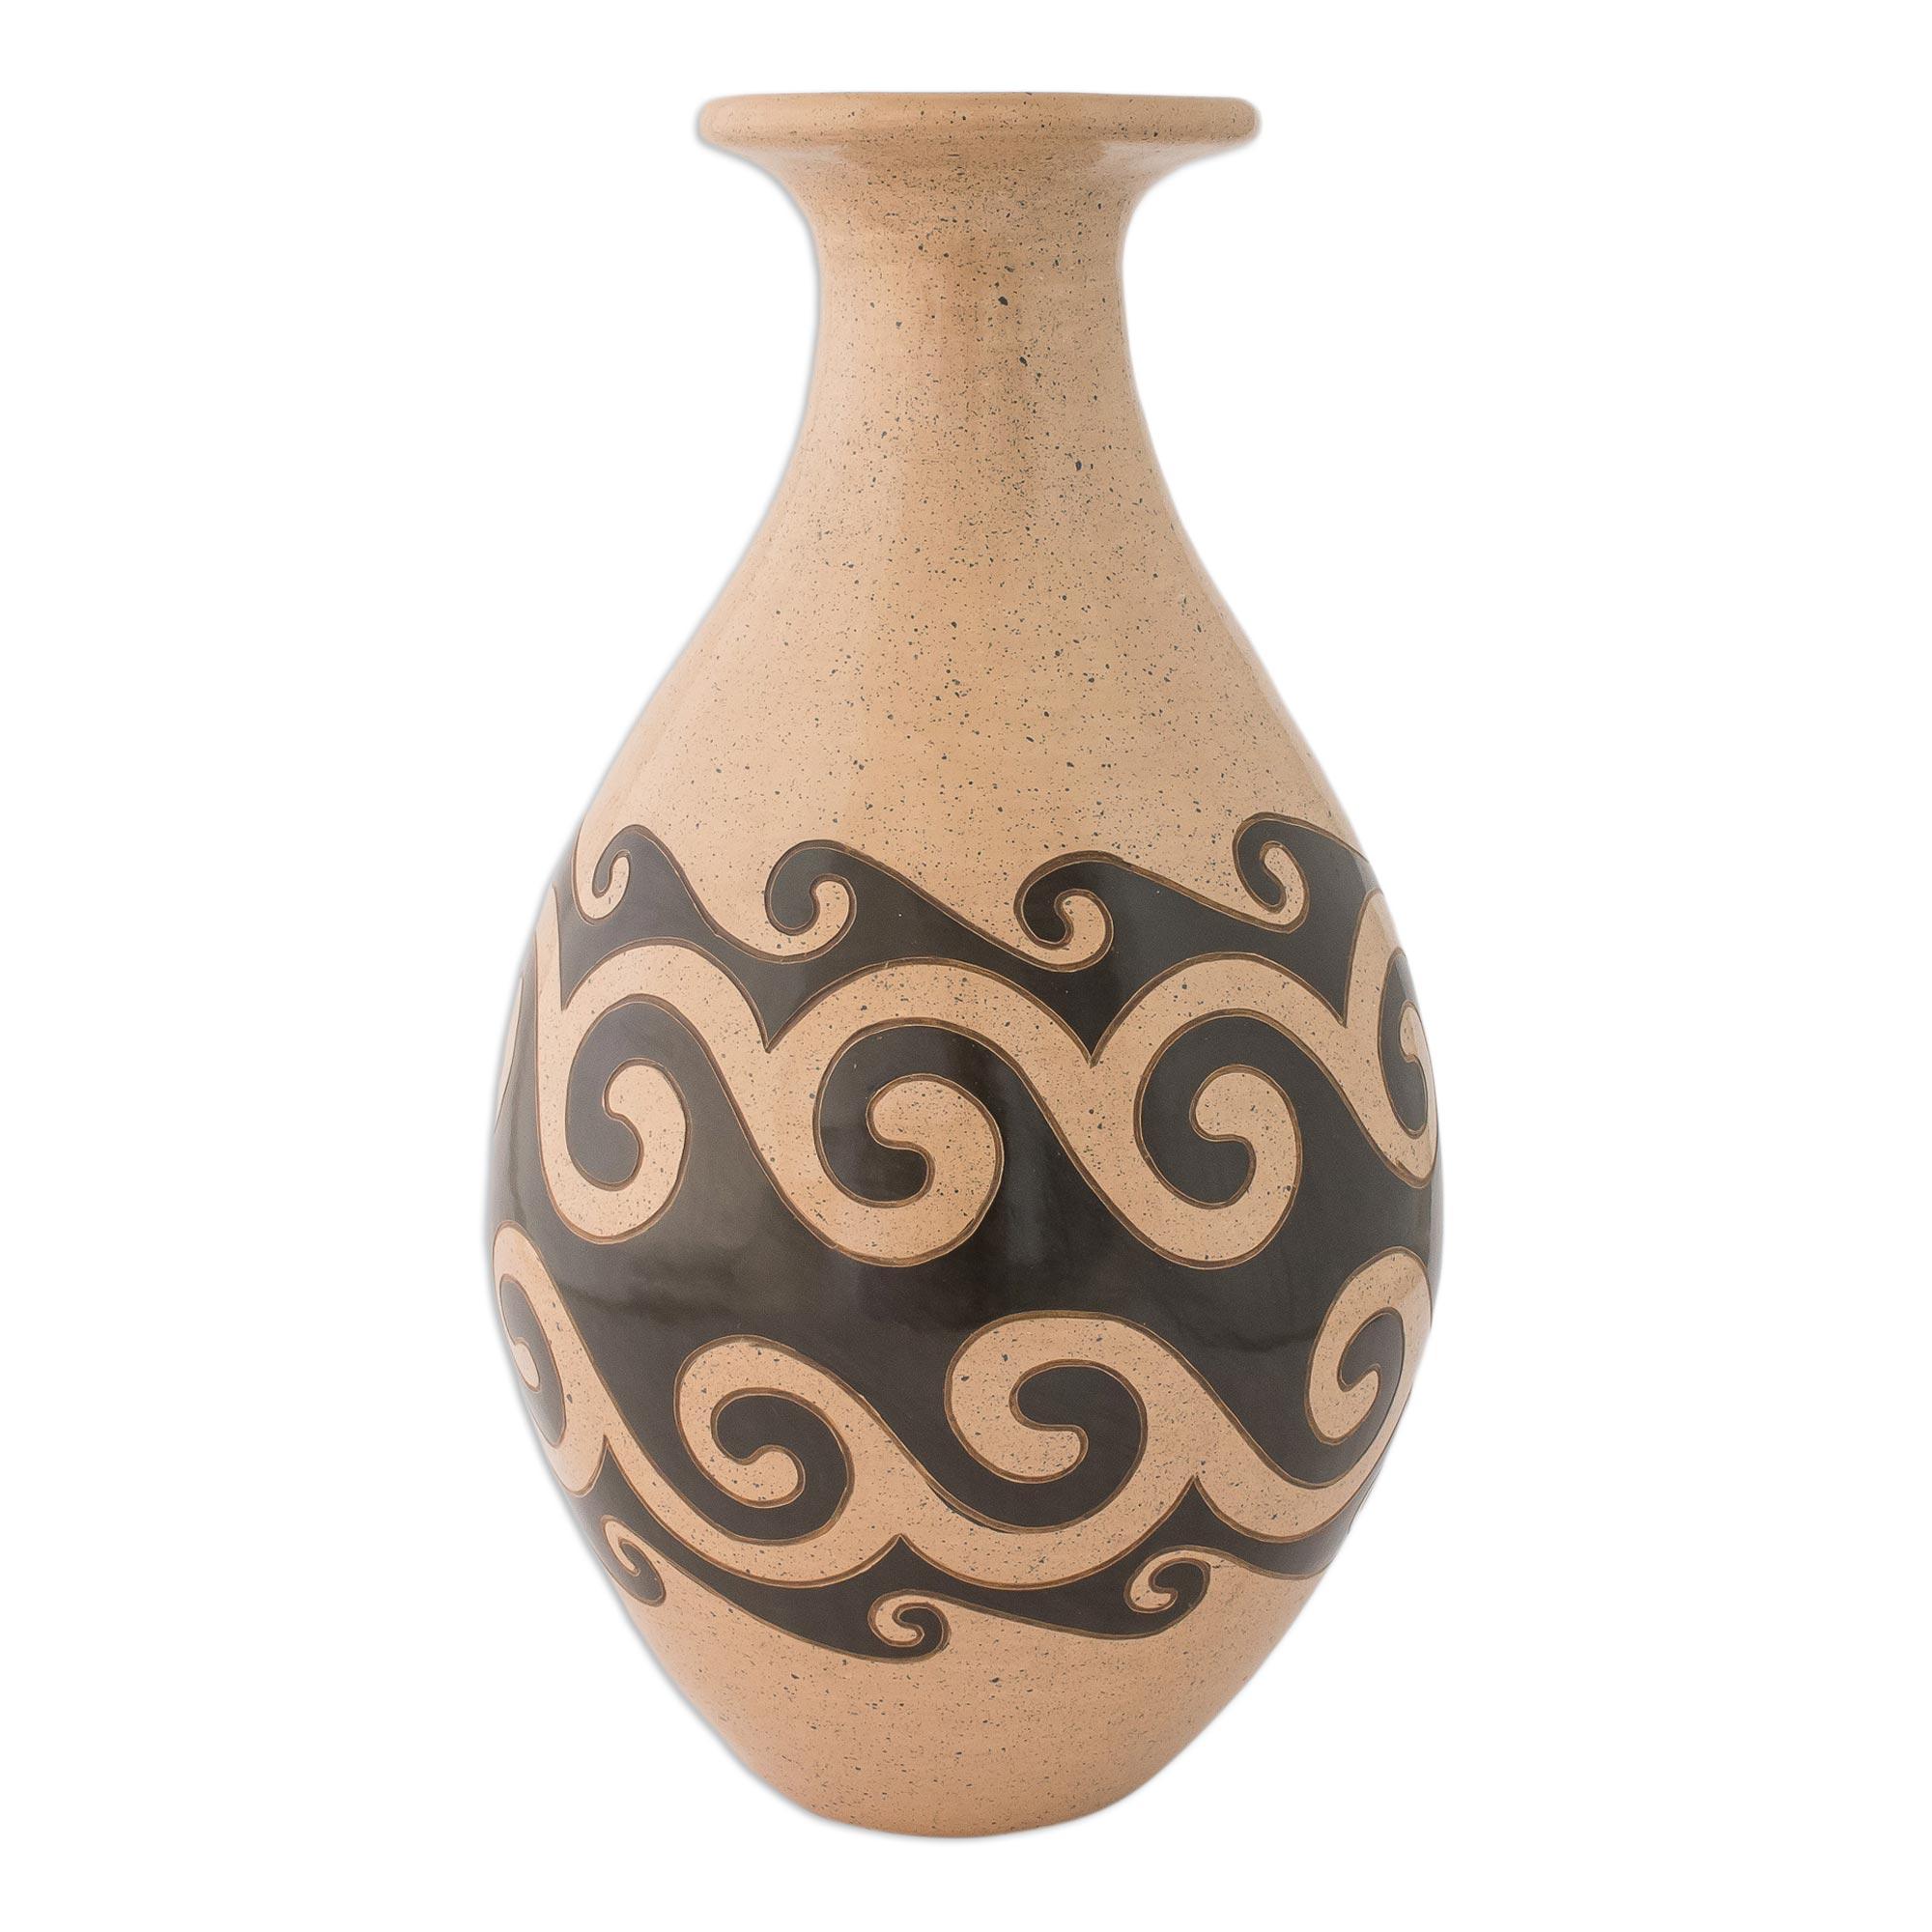 Painted Handmade Ceramic Vase